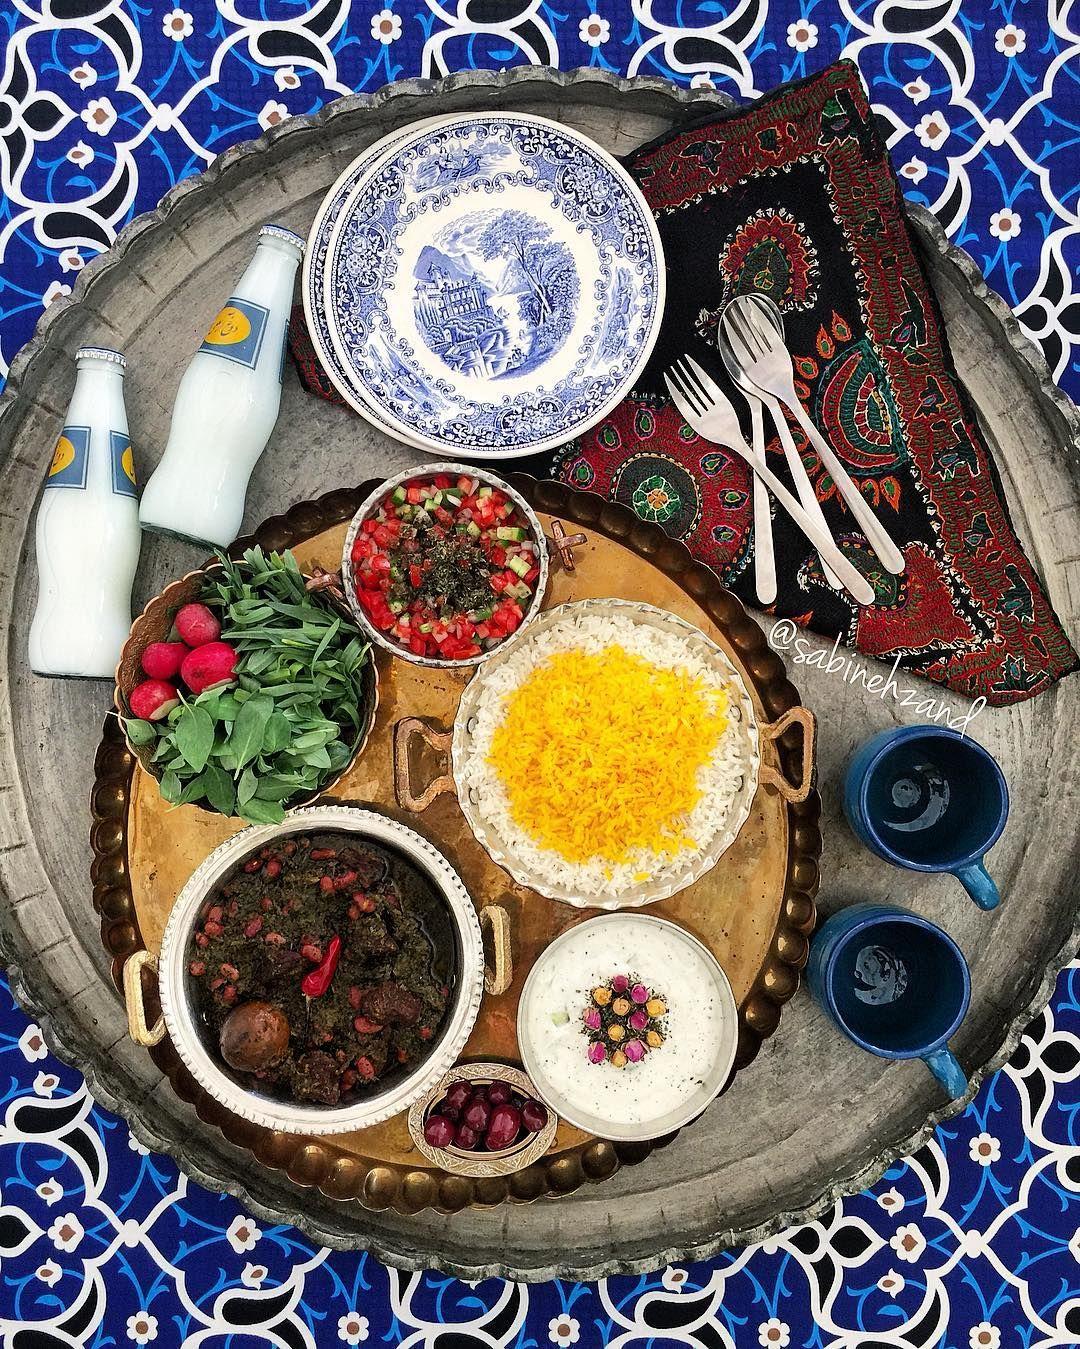 ghormeh sabzi persian herbs stew f o o d pinterest persisches essen orientalisches. Black Bedroom Furniture Sets. Home Design Ideas